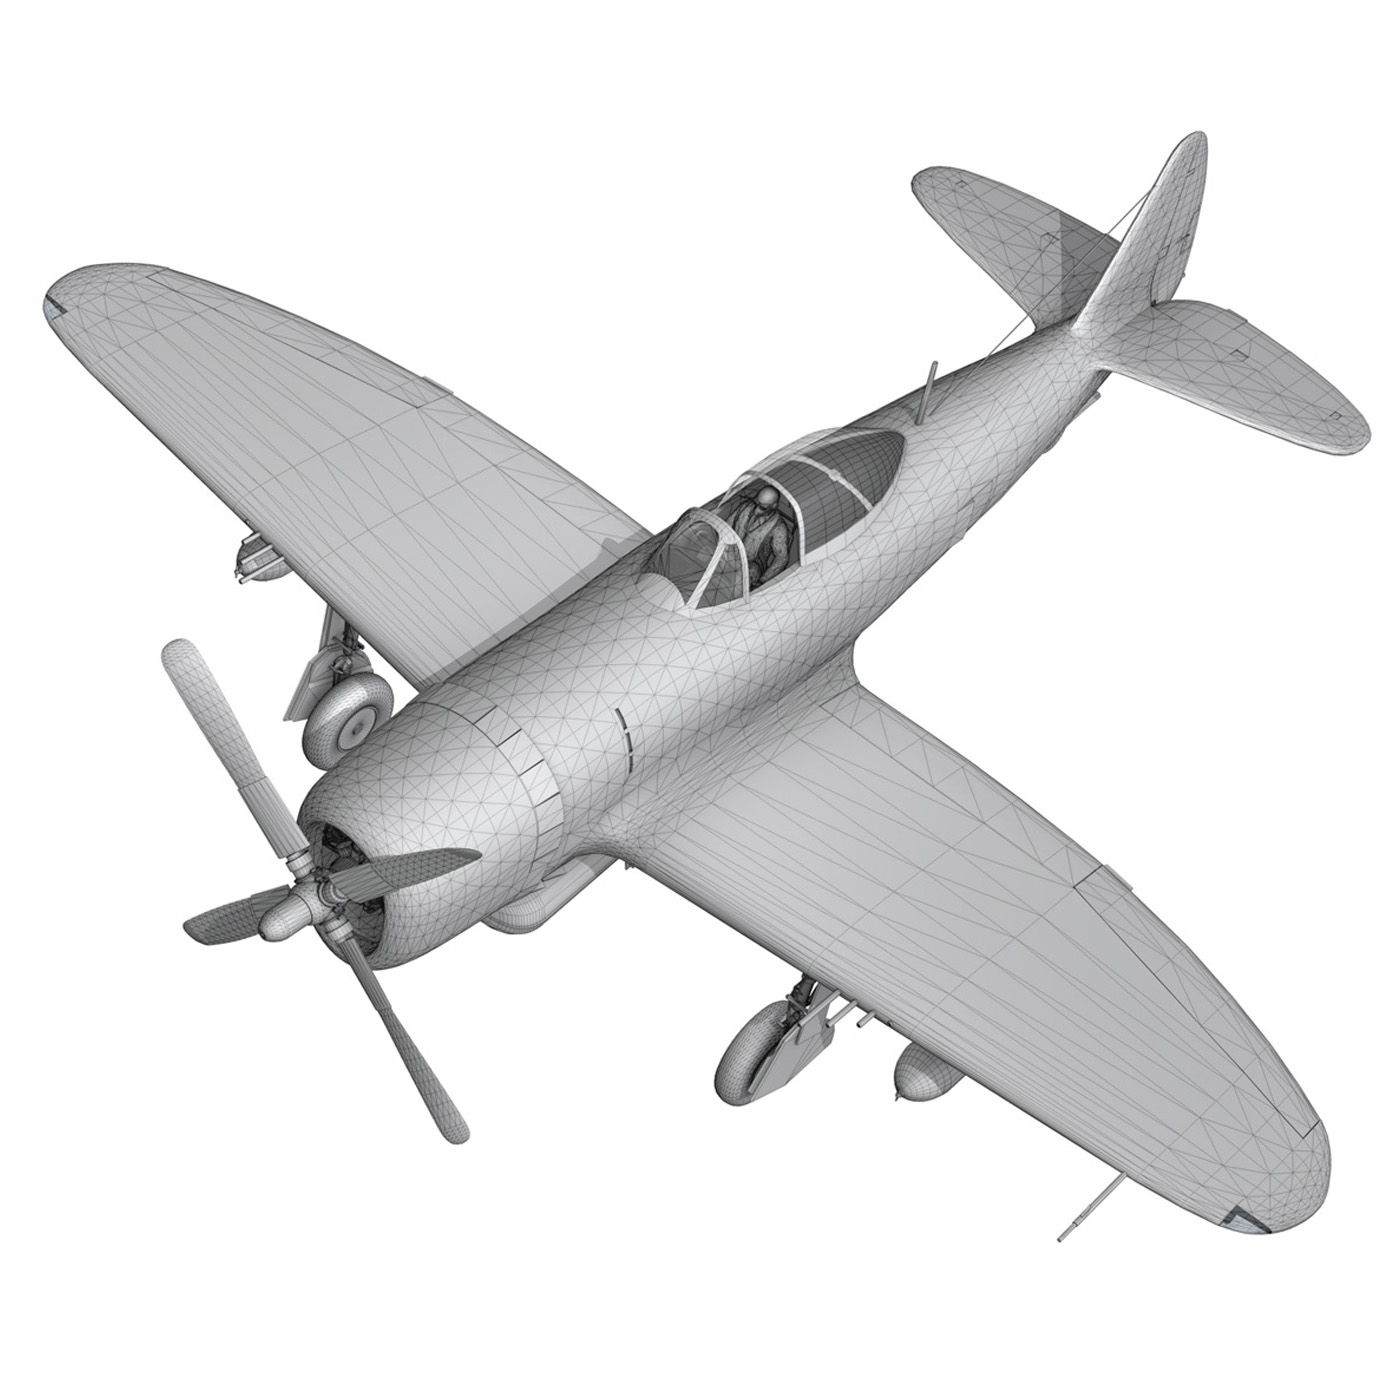 republic p-47 thunderbolt – oh johnnie 3d model fbx c4d lwo obj 274265